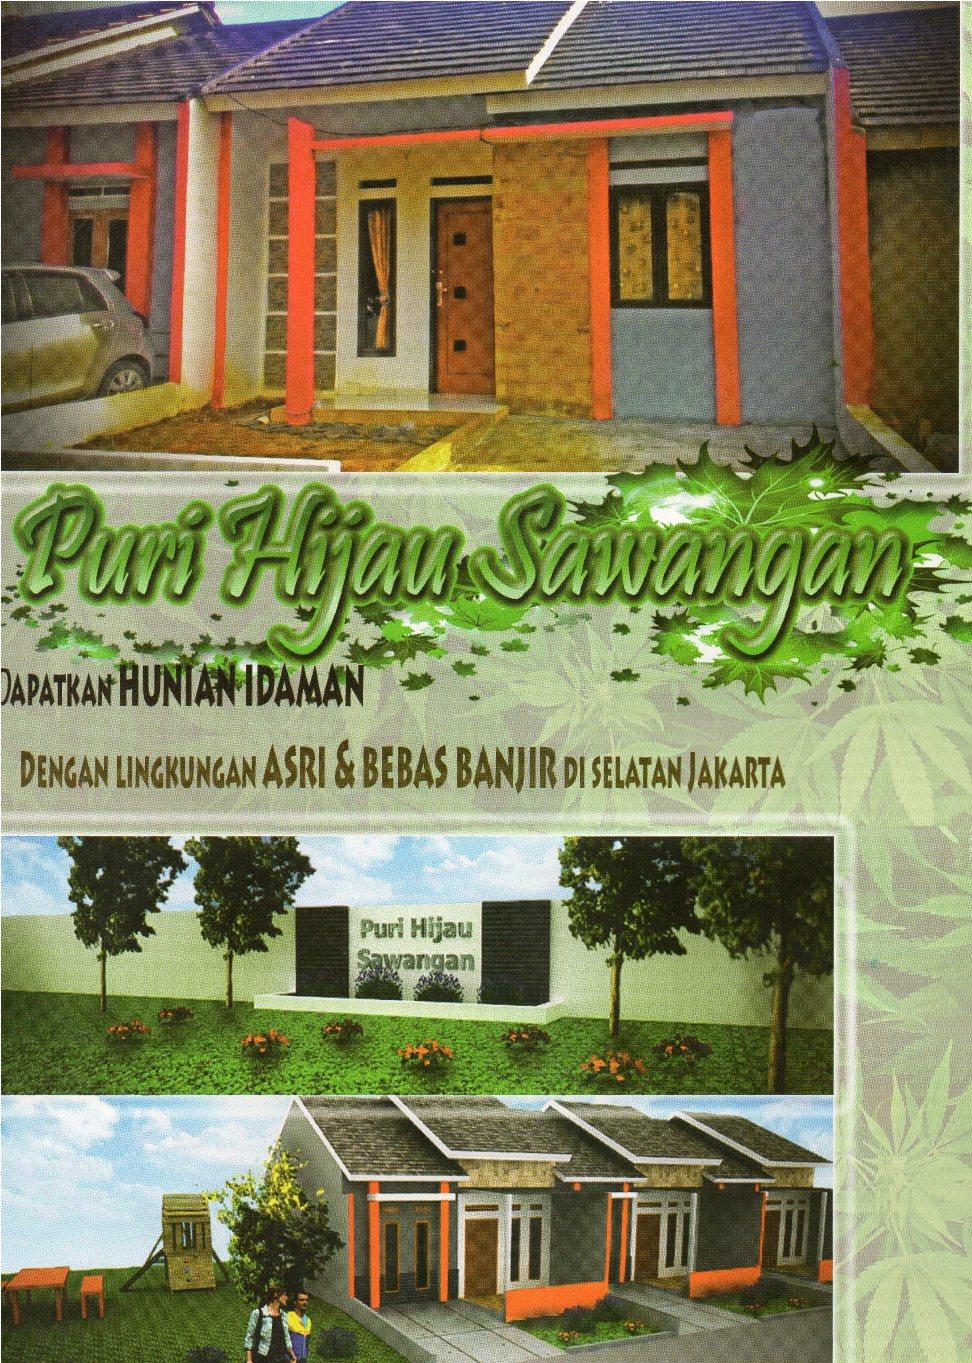 Puri Hijau Sawangan